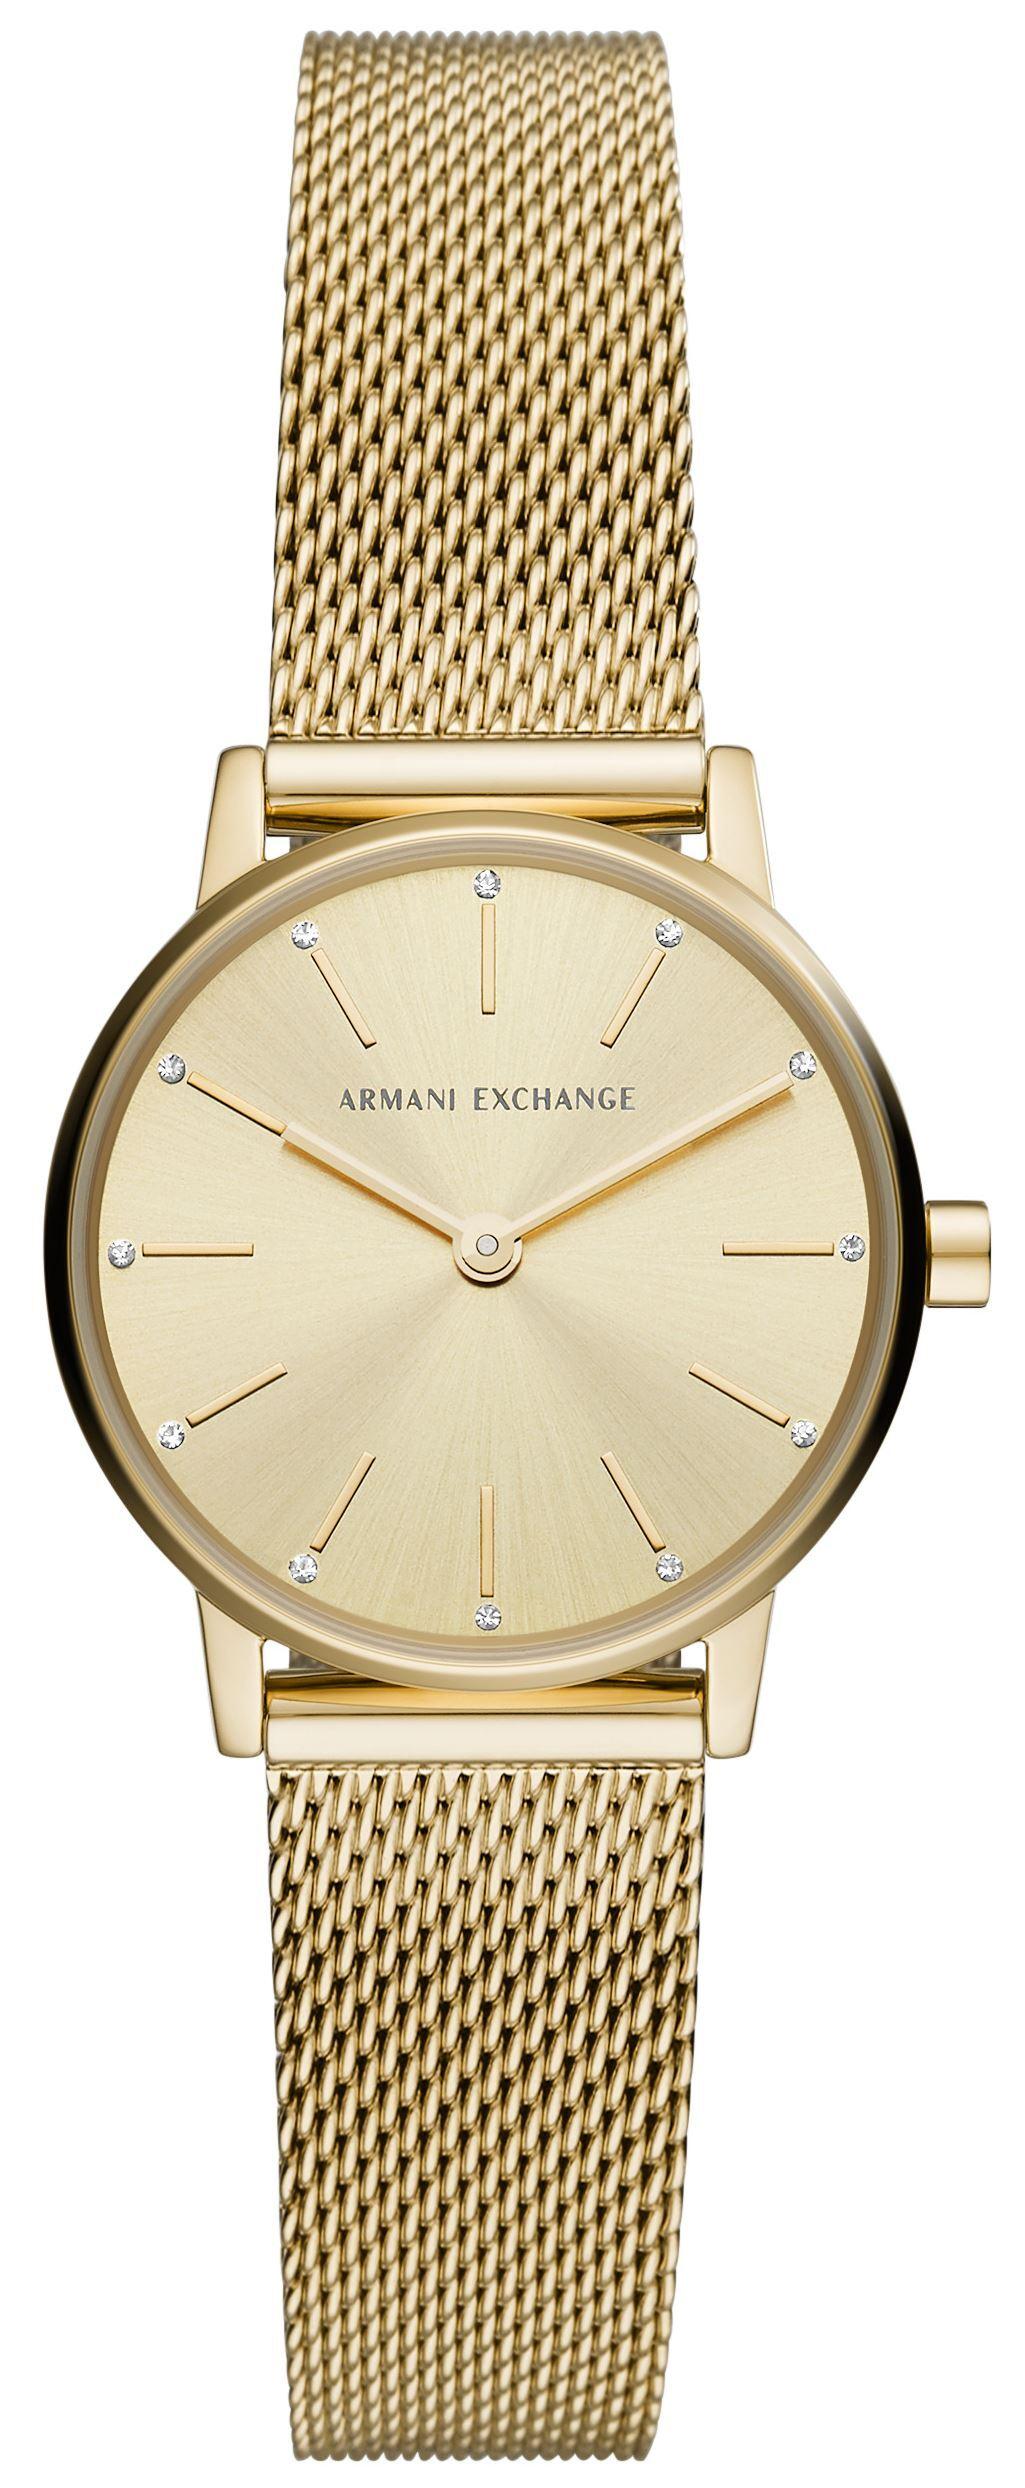 Armani Exchange LOLA Dameur AX5567 Guldfarvet/Guldtonet stål Ø28 mm